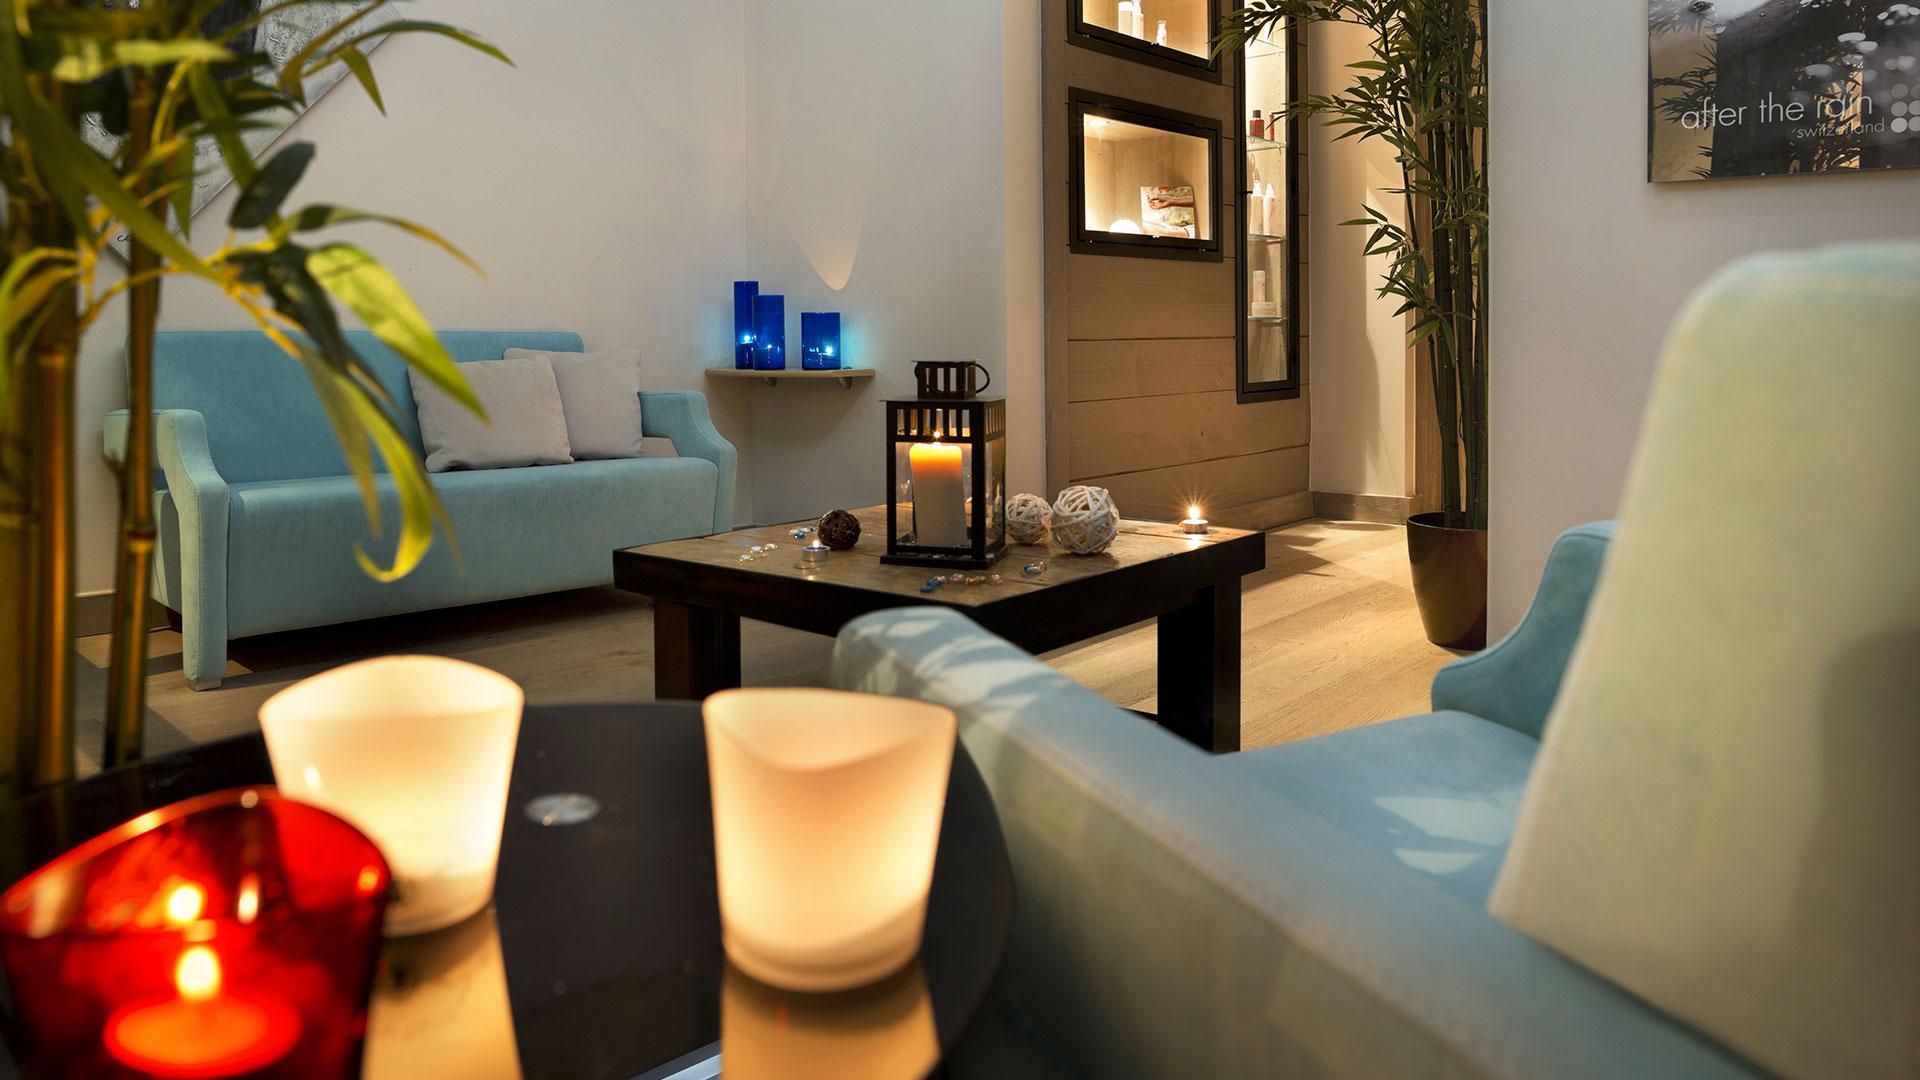 Le chalet des dolines holiday apartment in montgen vre for Salon le 58